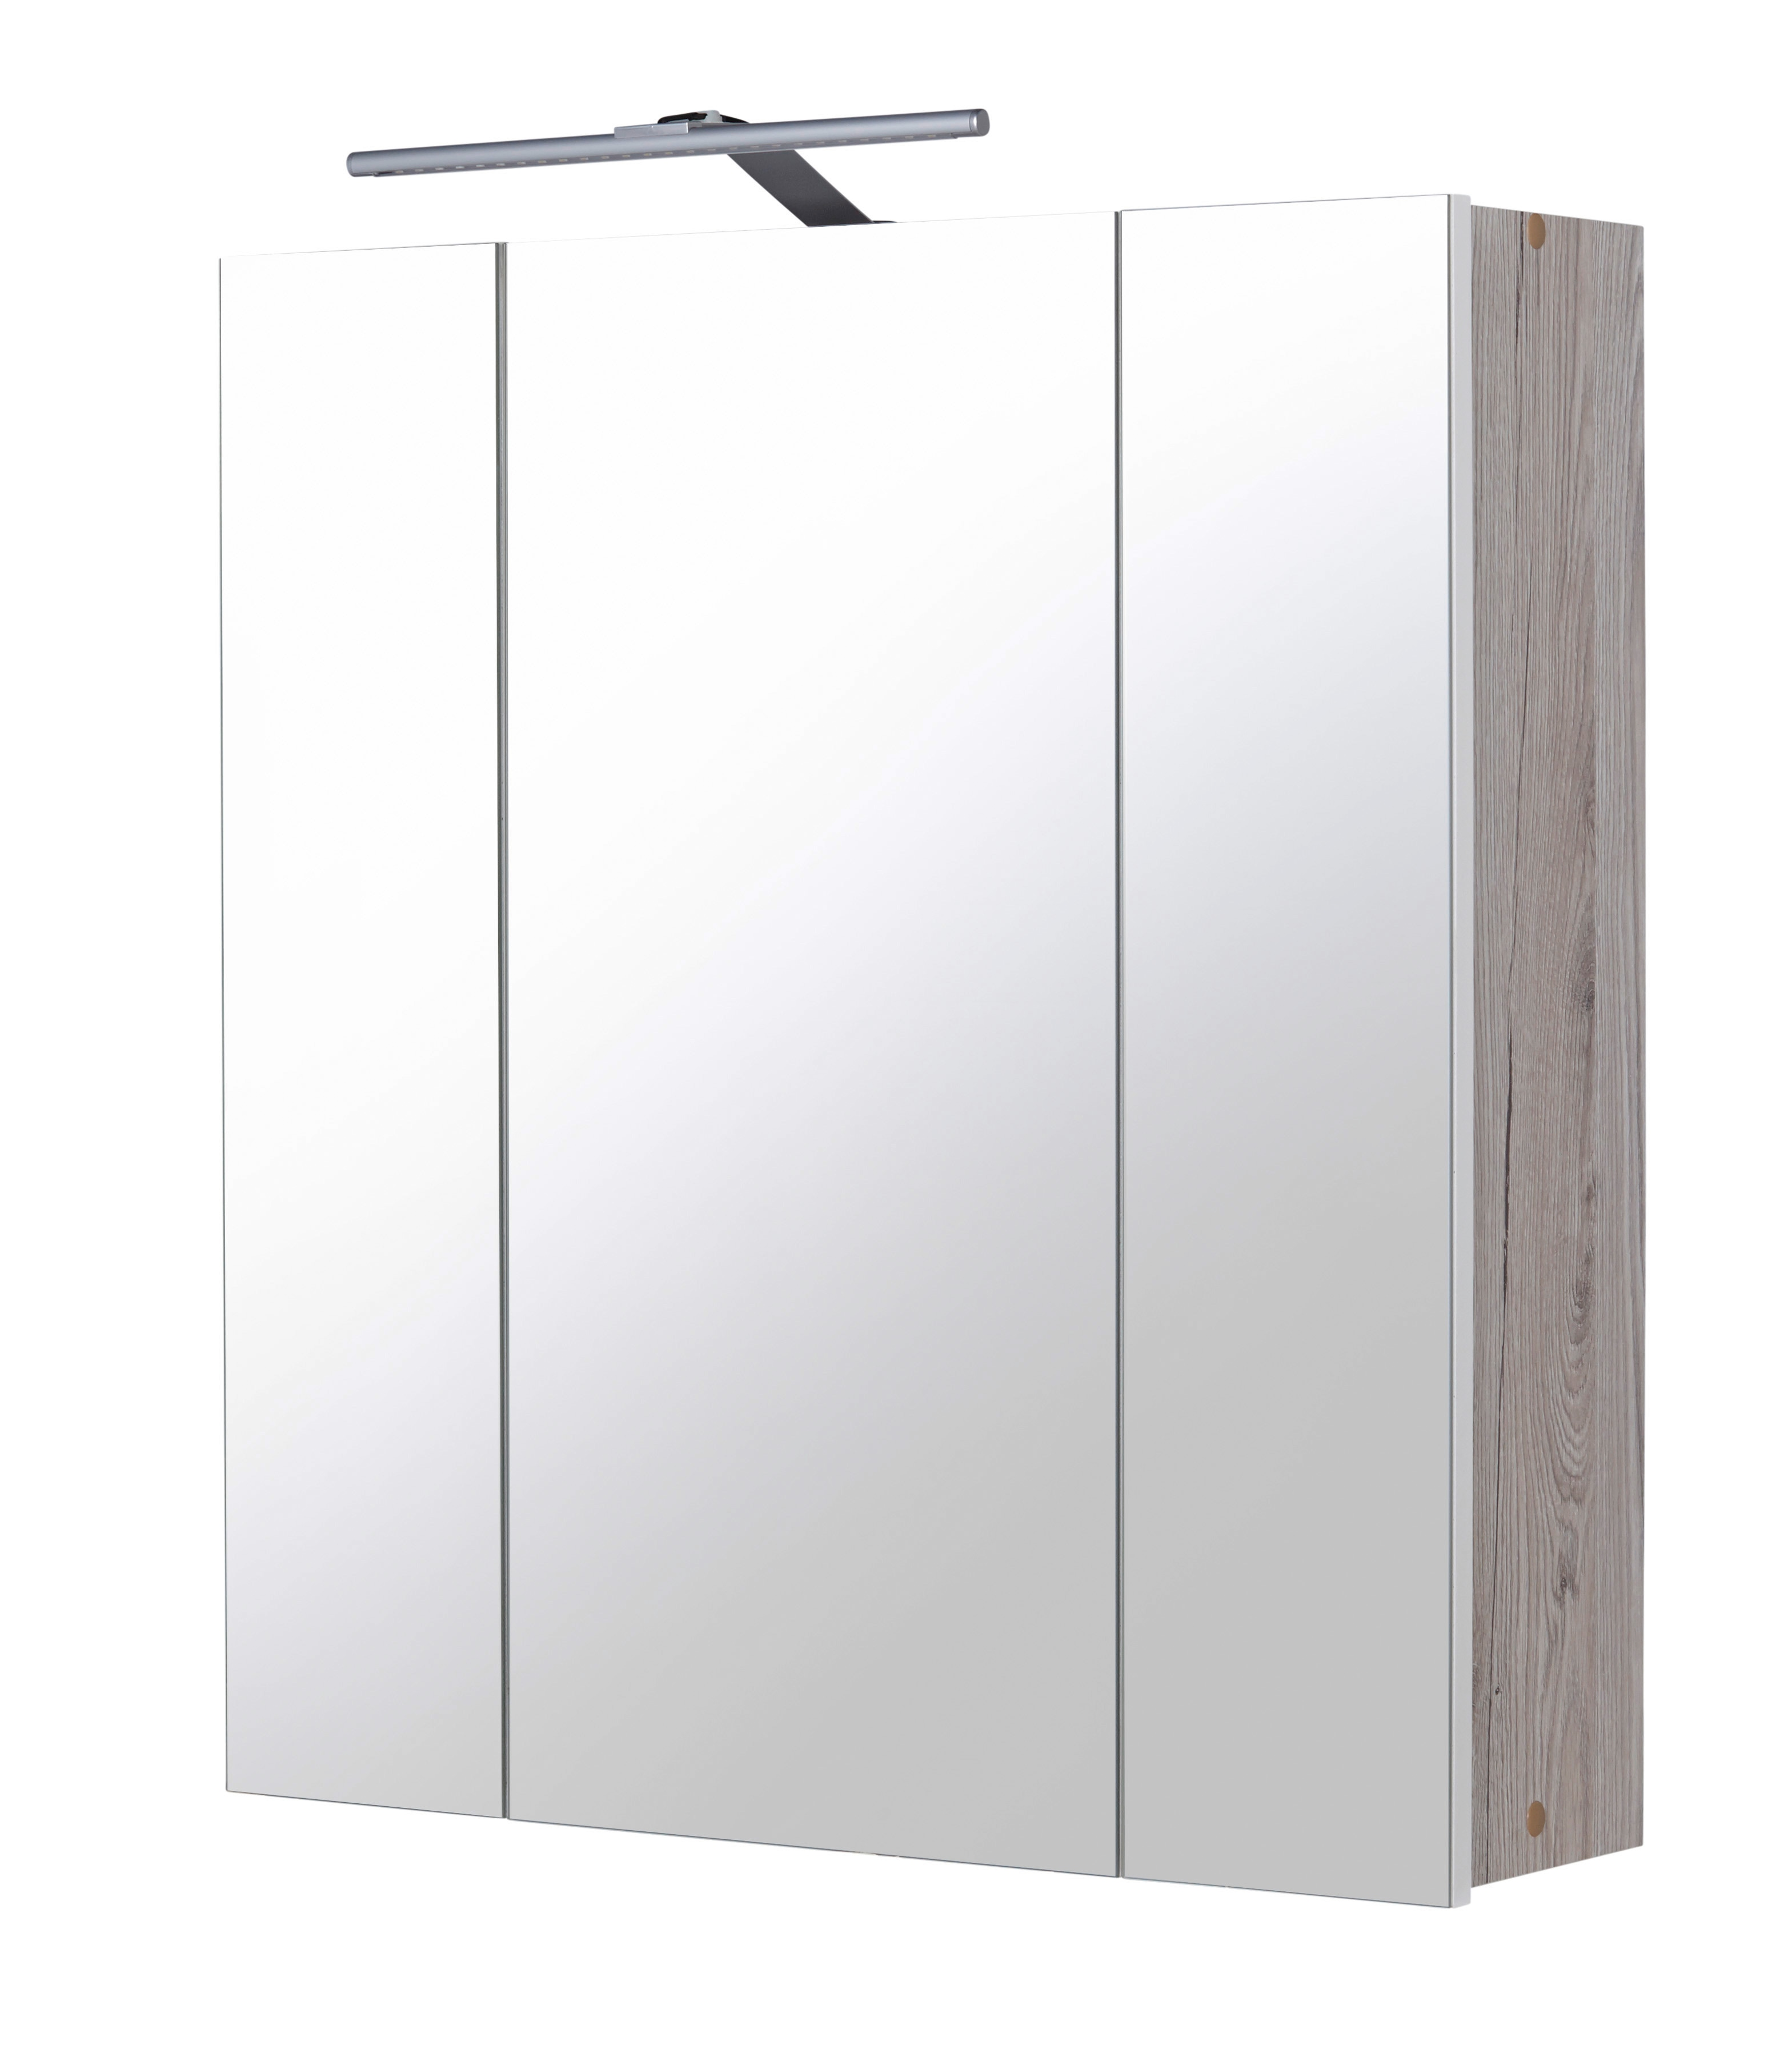 kesper spiegelschrank new york breite 60 cm mit led. Black Bedroom Furniture Sets. Home Design Ideas